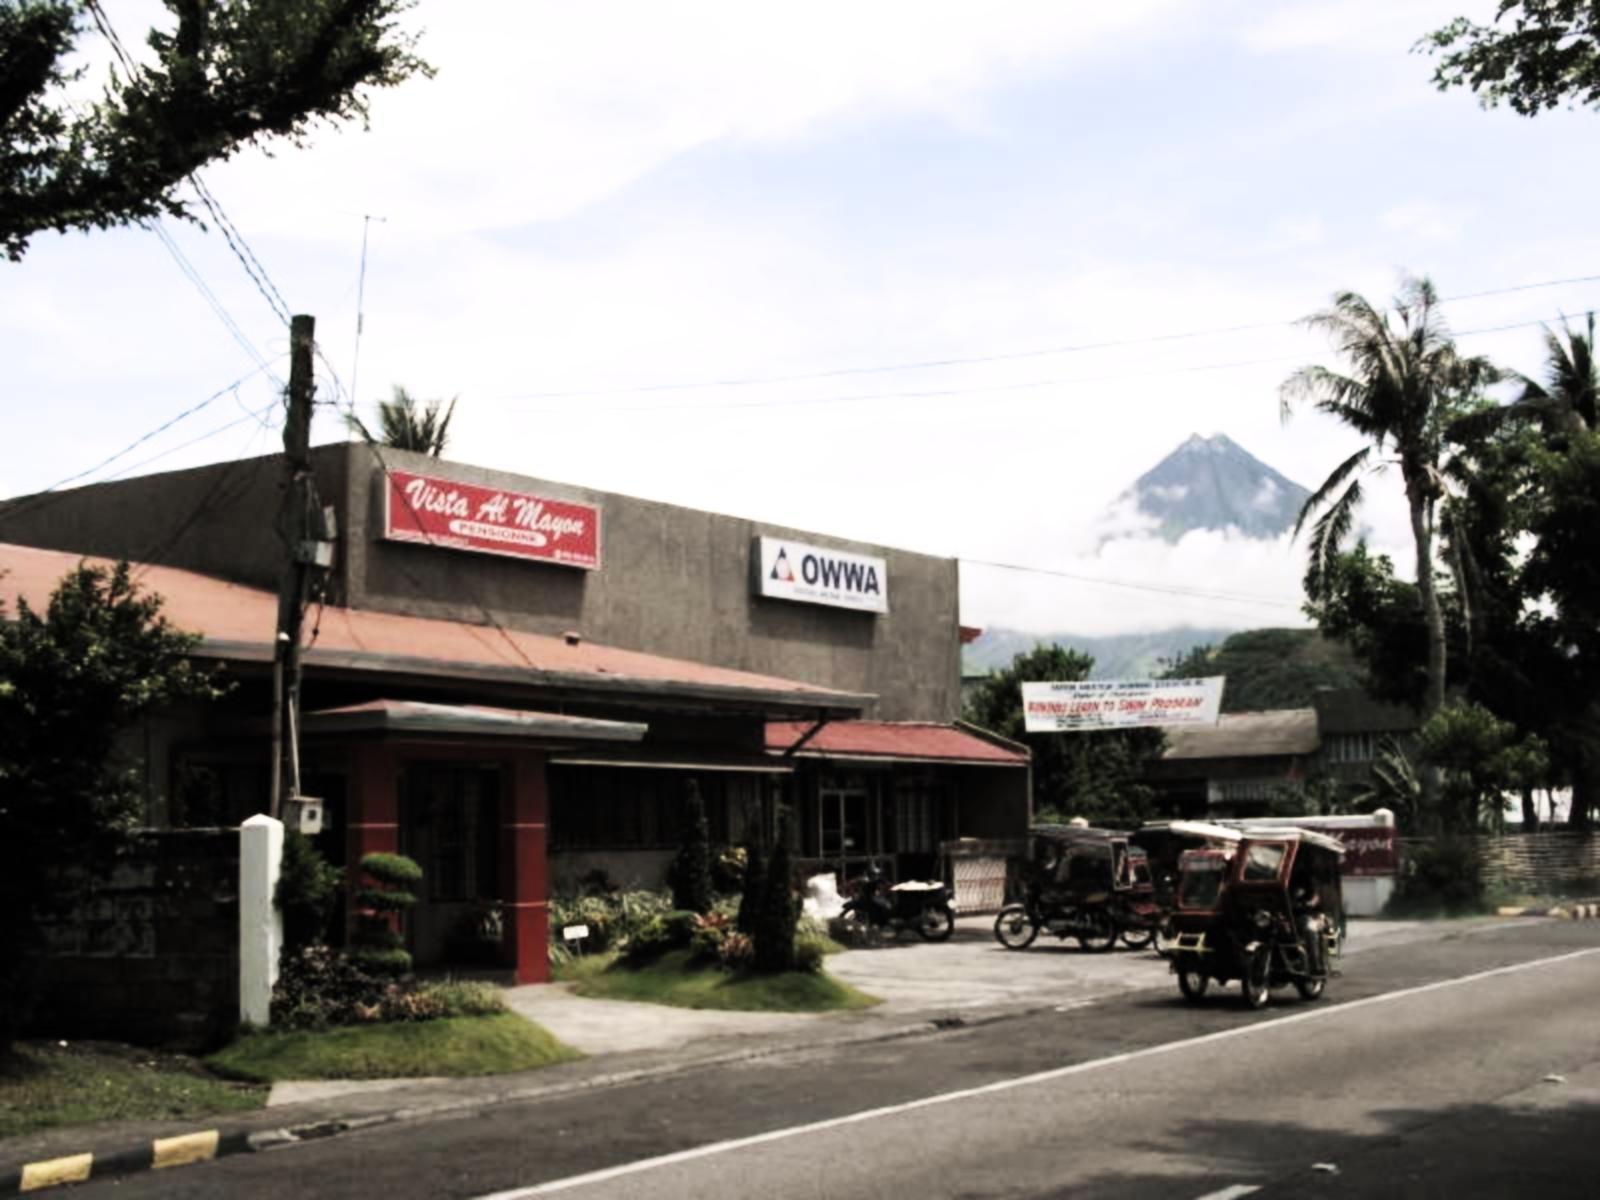 Vista Al Mayon Pensionne, Legazpi City